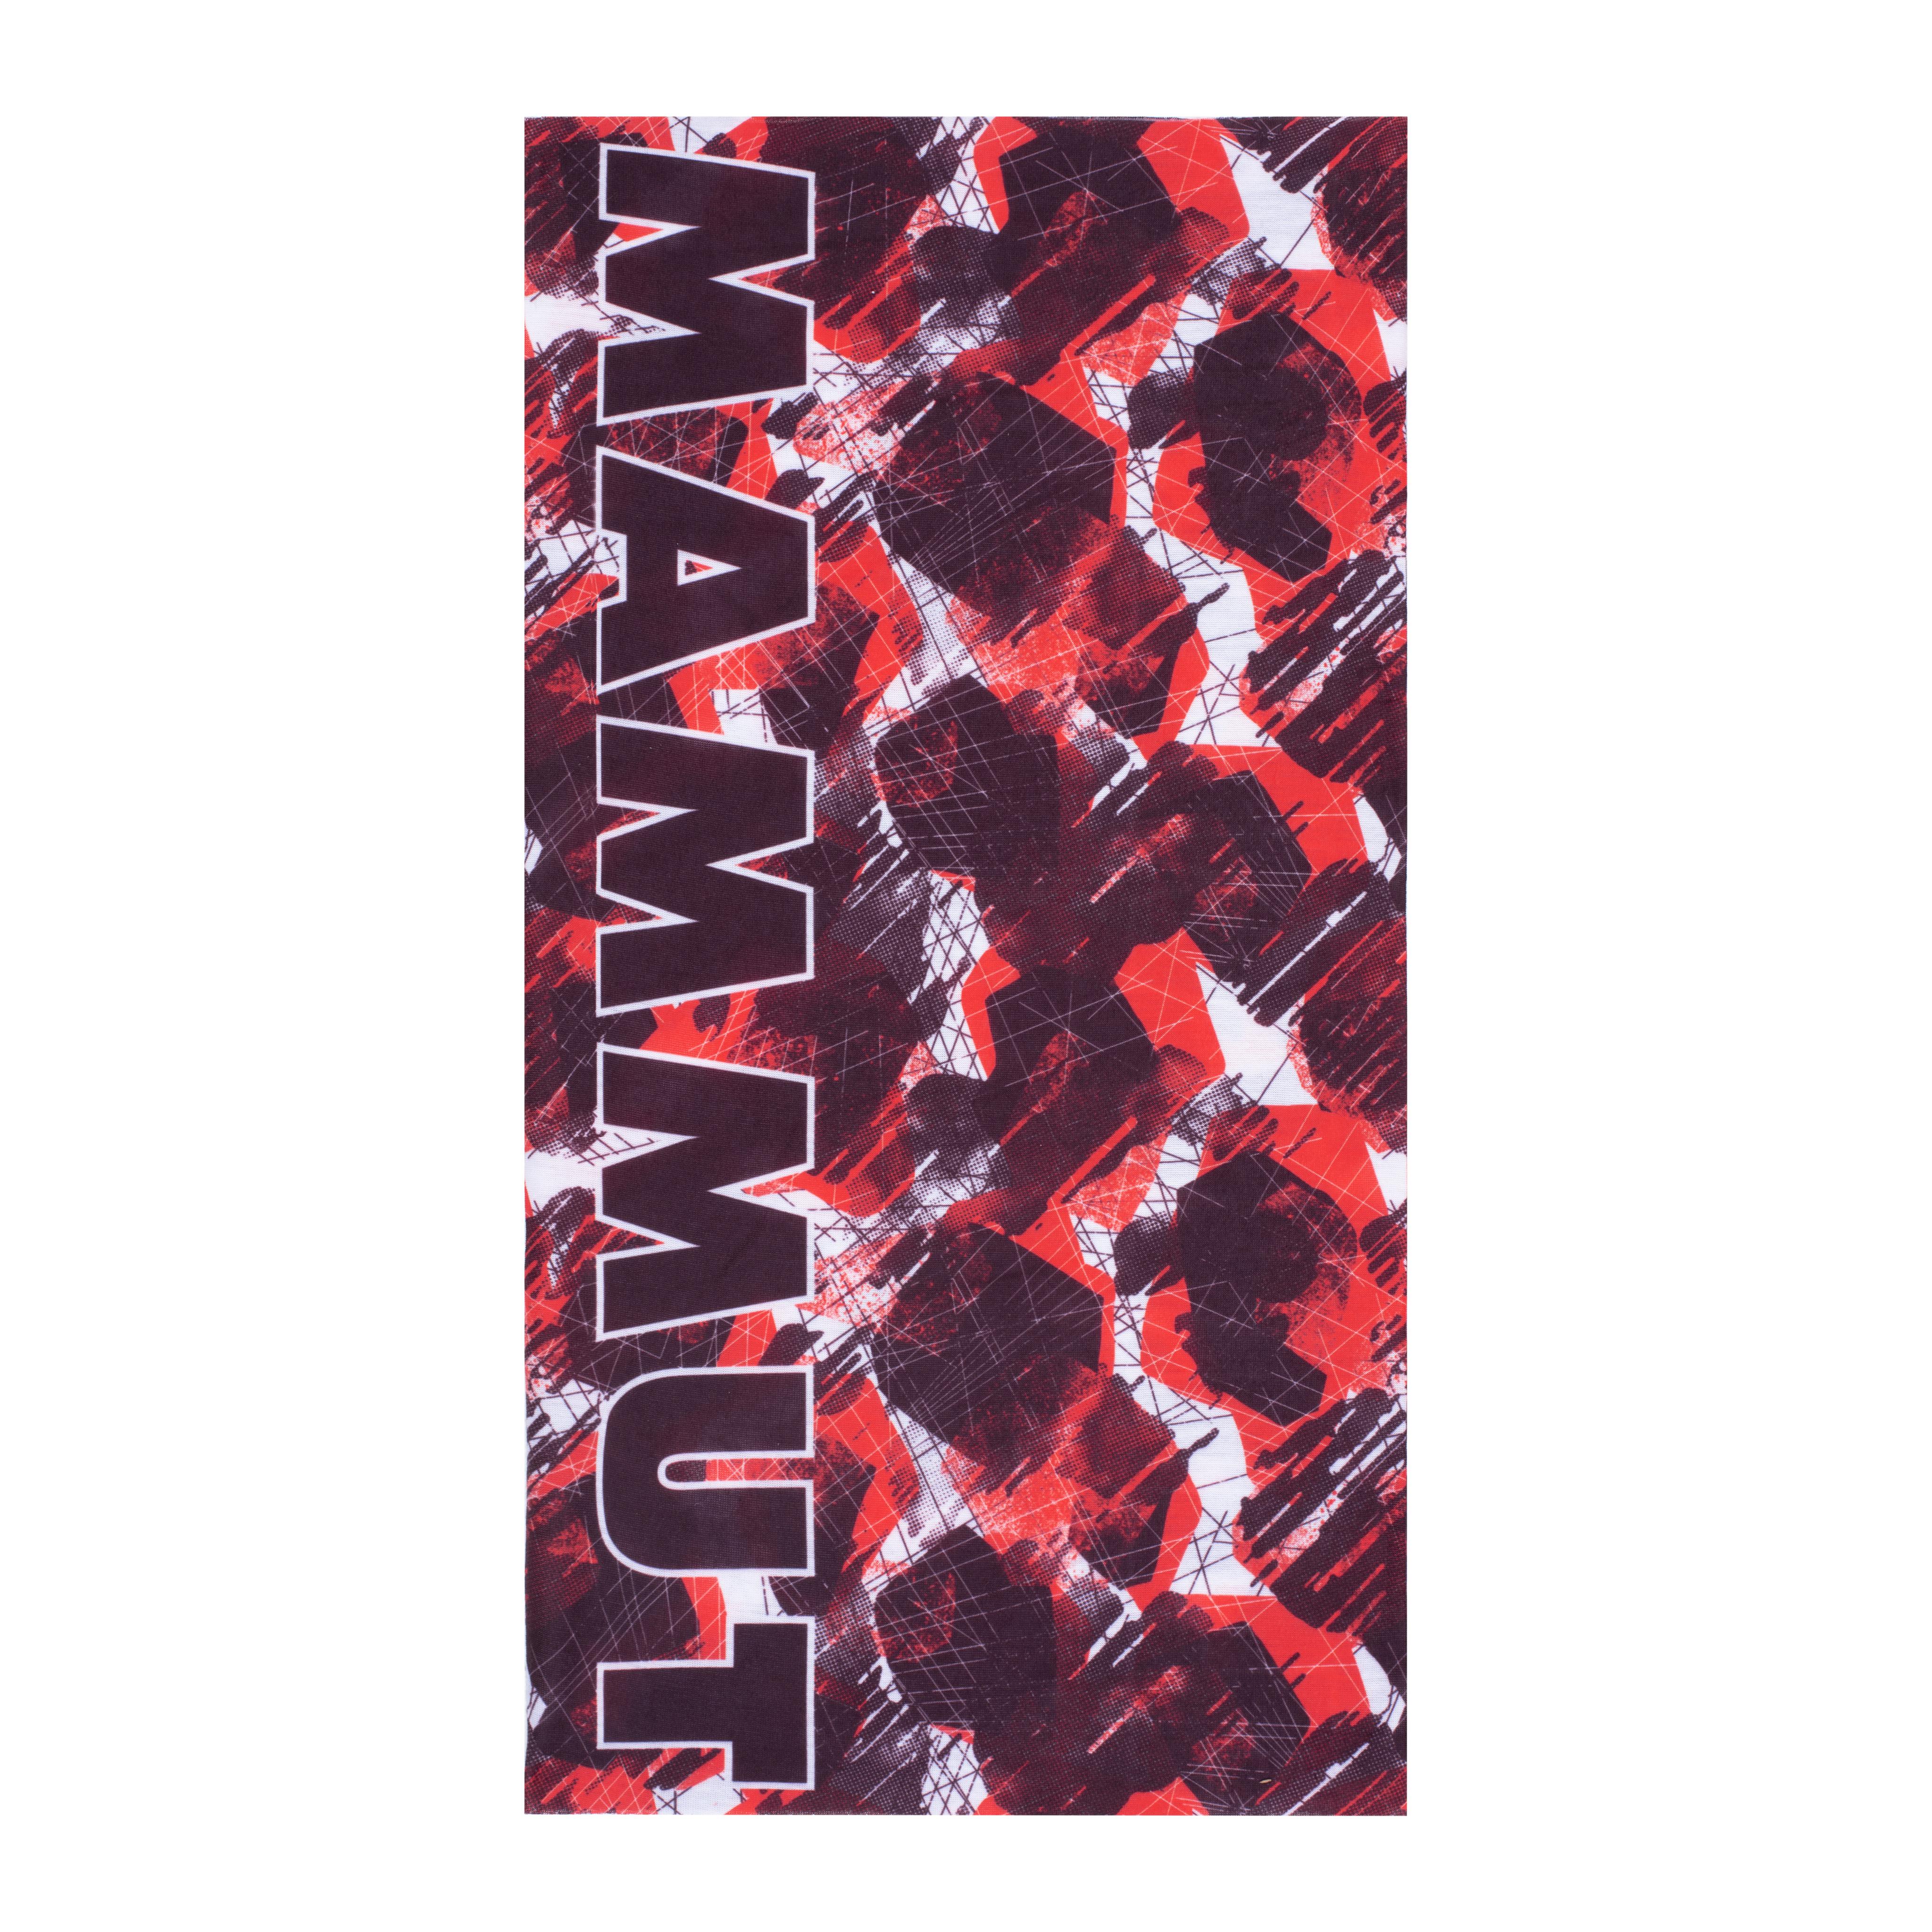 Mammut Neck Gaiter - grape-sunset camo, one size product image